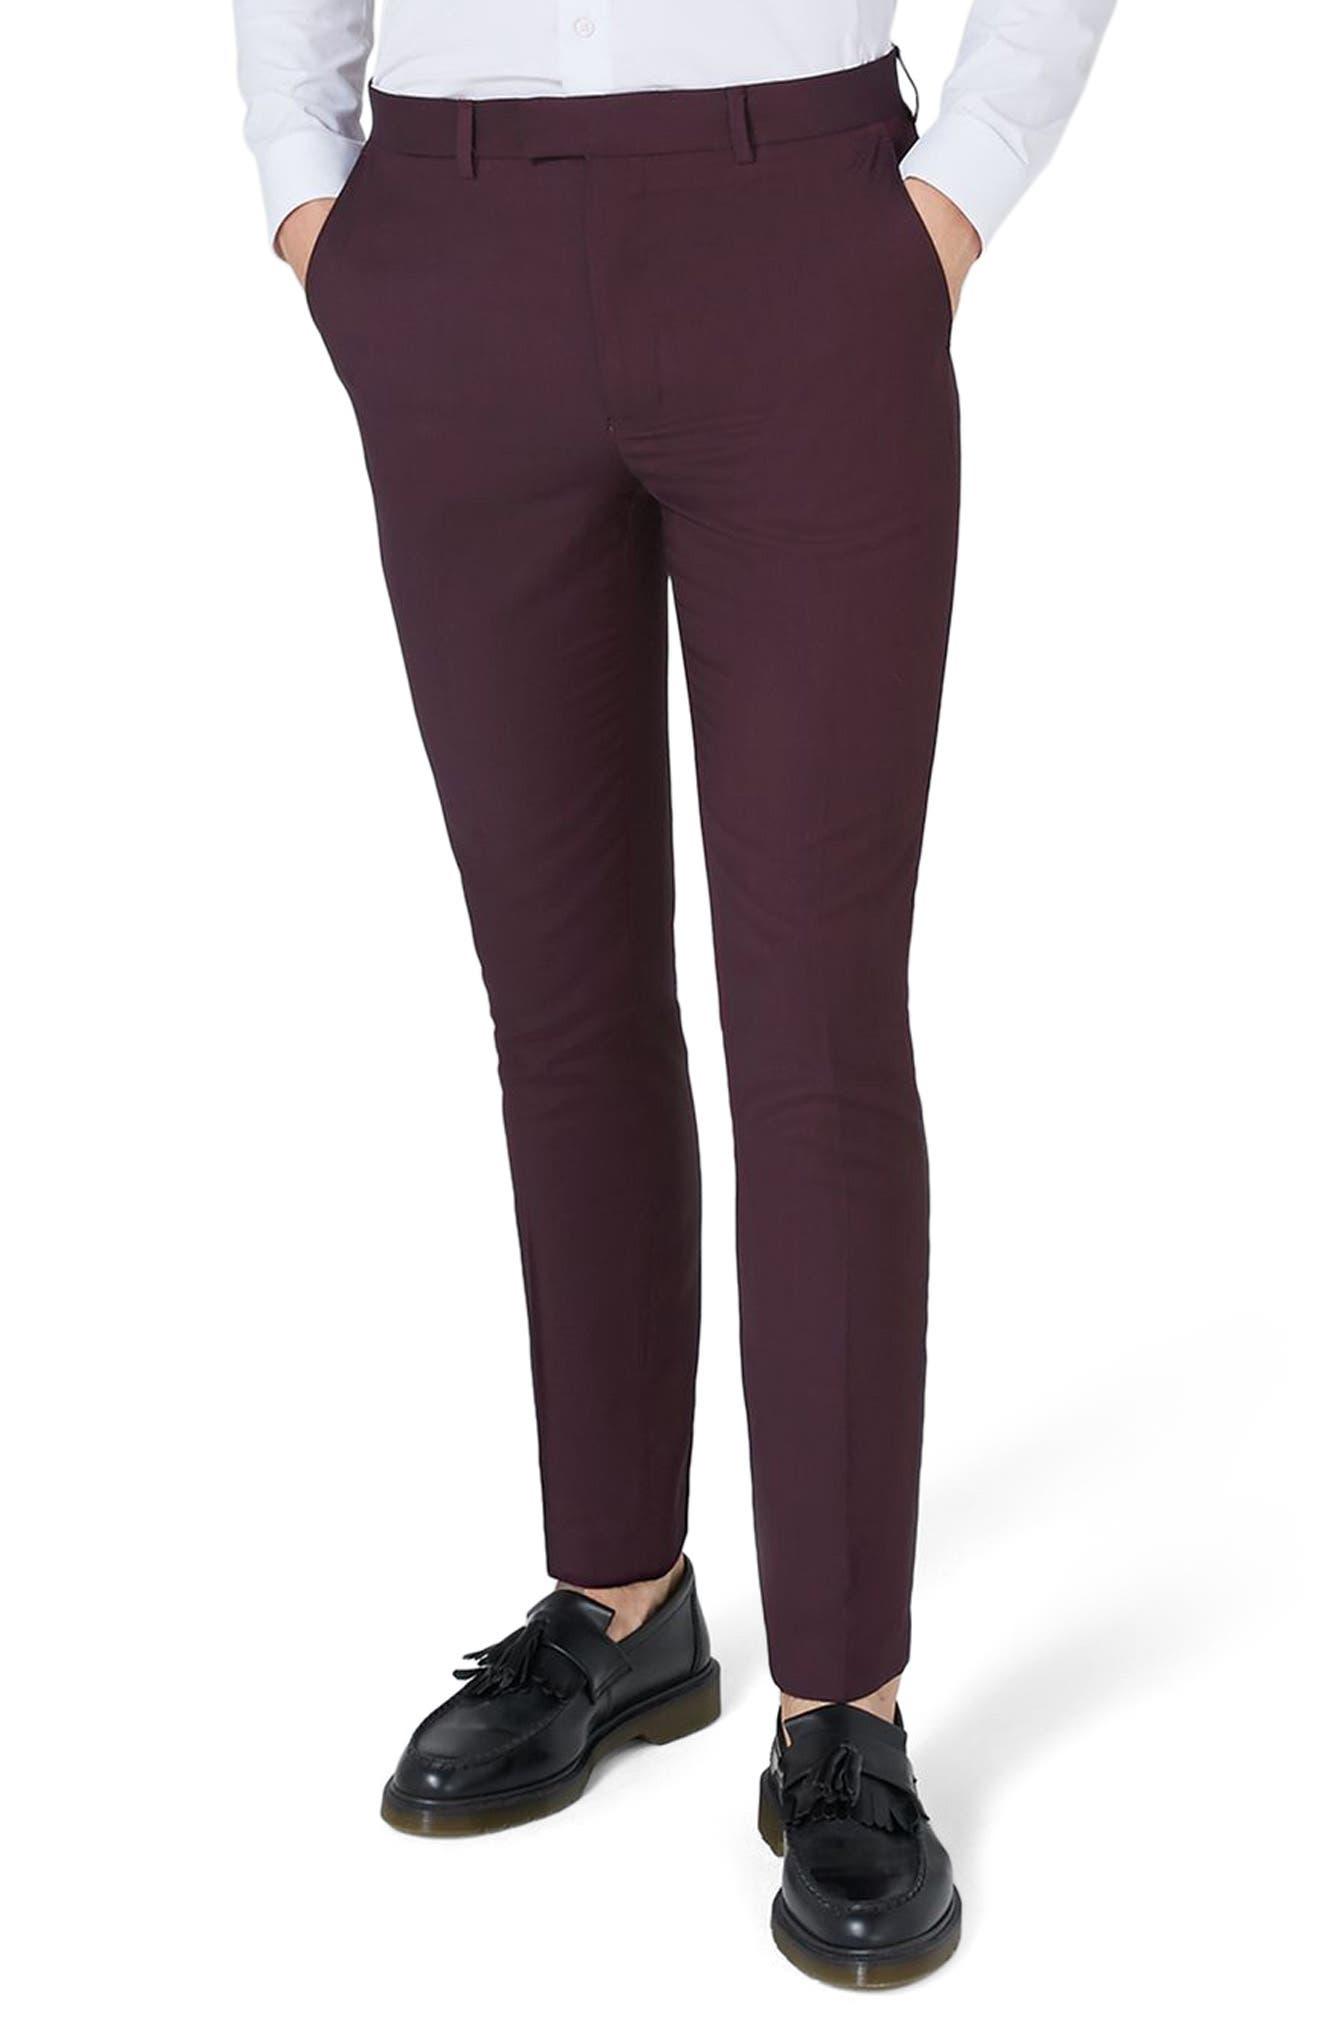 Main Image - Topman Skinny Fit Plum Suit Trousers